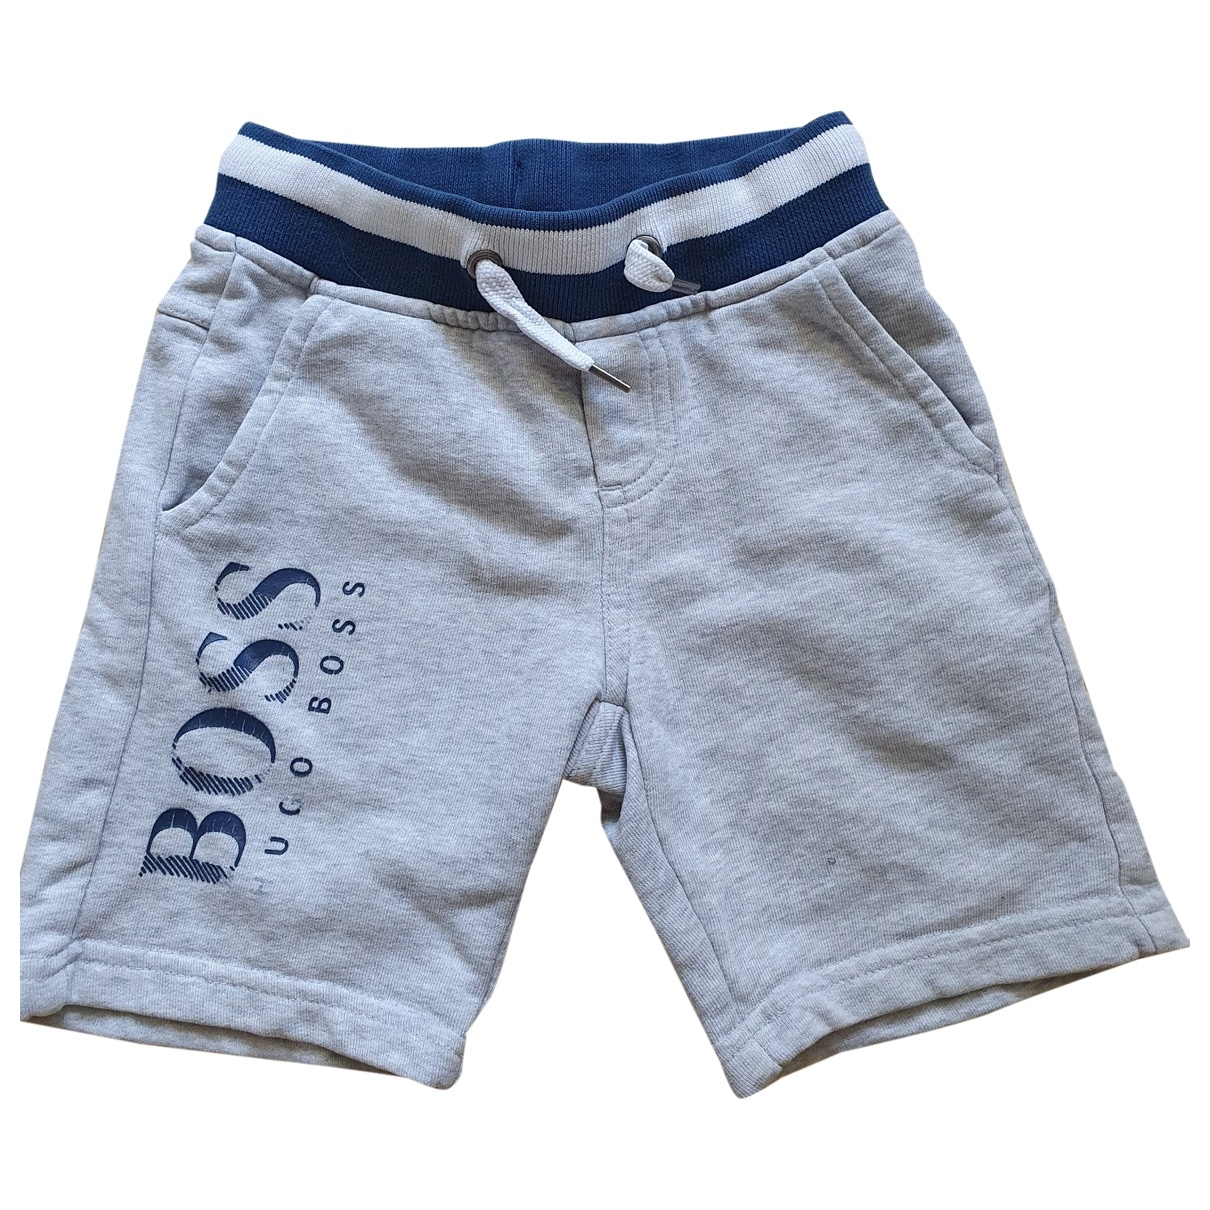 Pantalon corto Boss